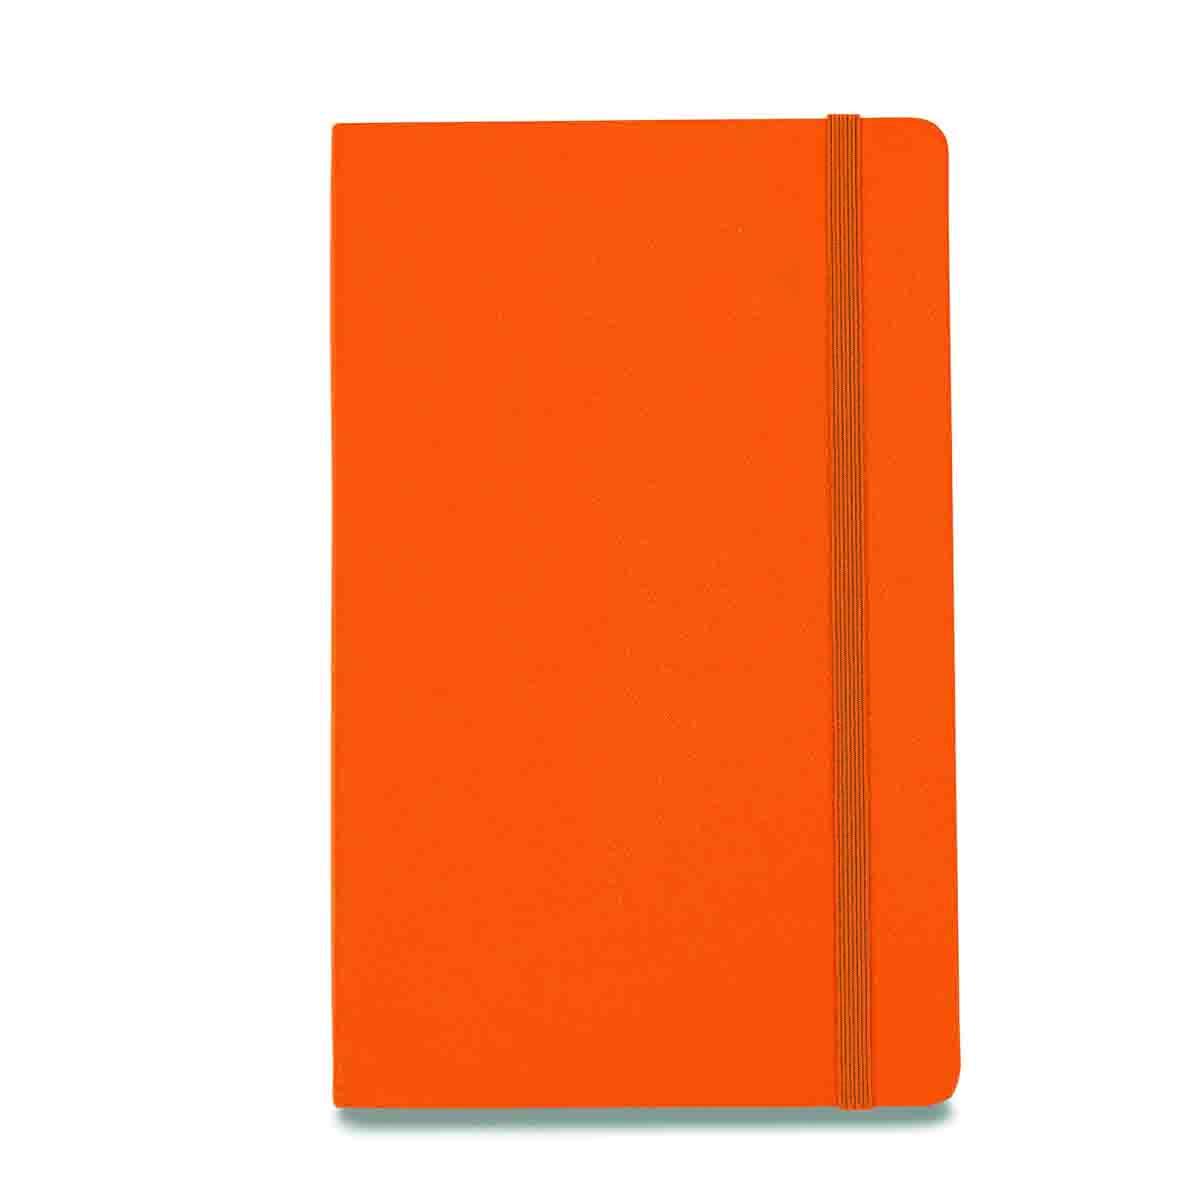 Gemline moleskinehardcovernotebook orange